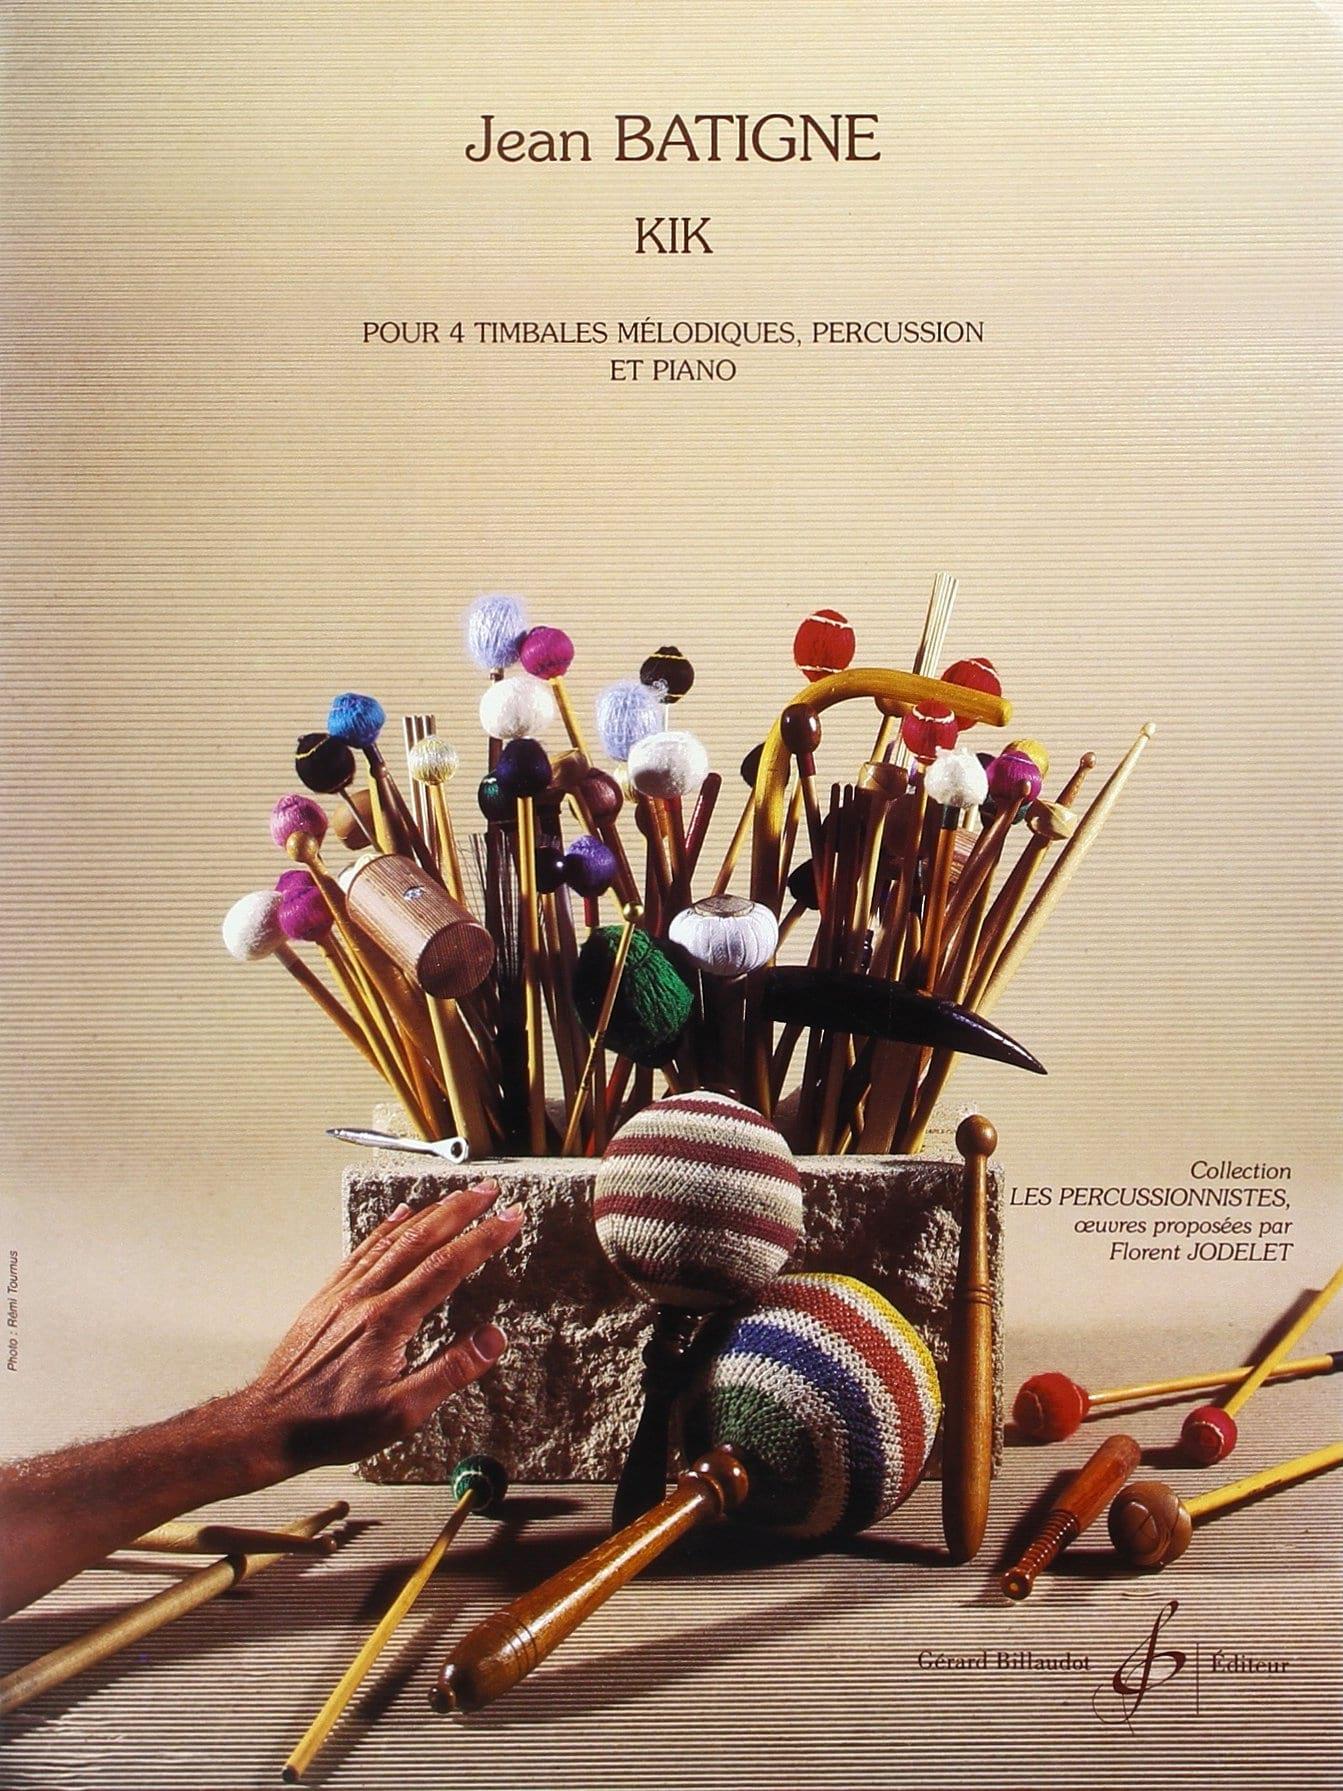 Kik - Jean Batigne - Partition - Multi Percussions - laflutedepan.com